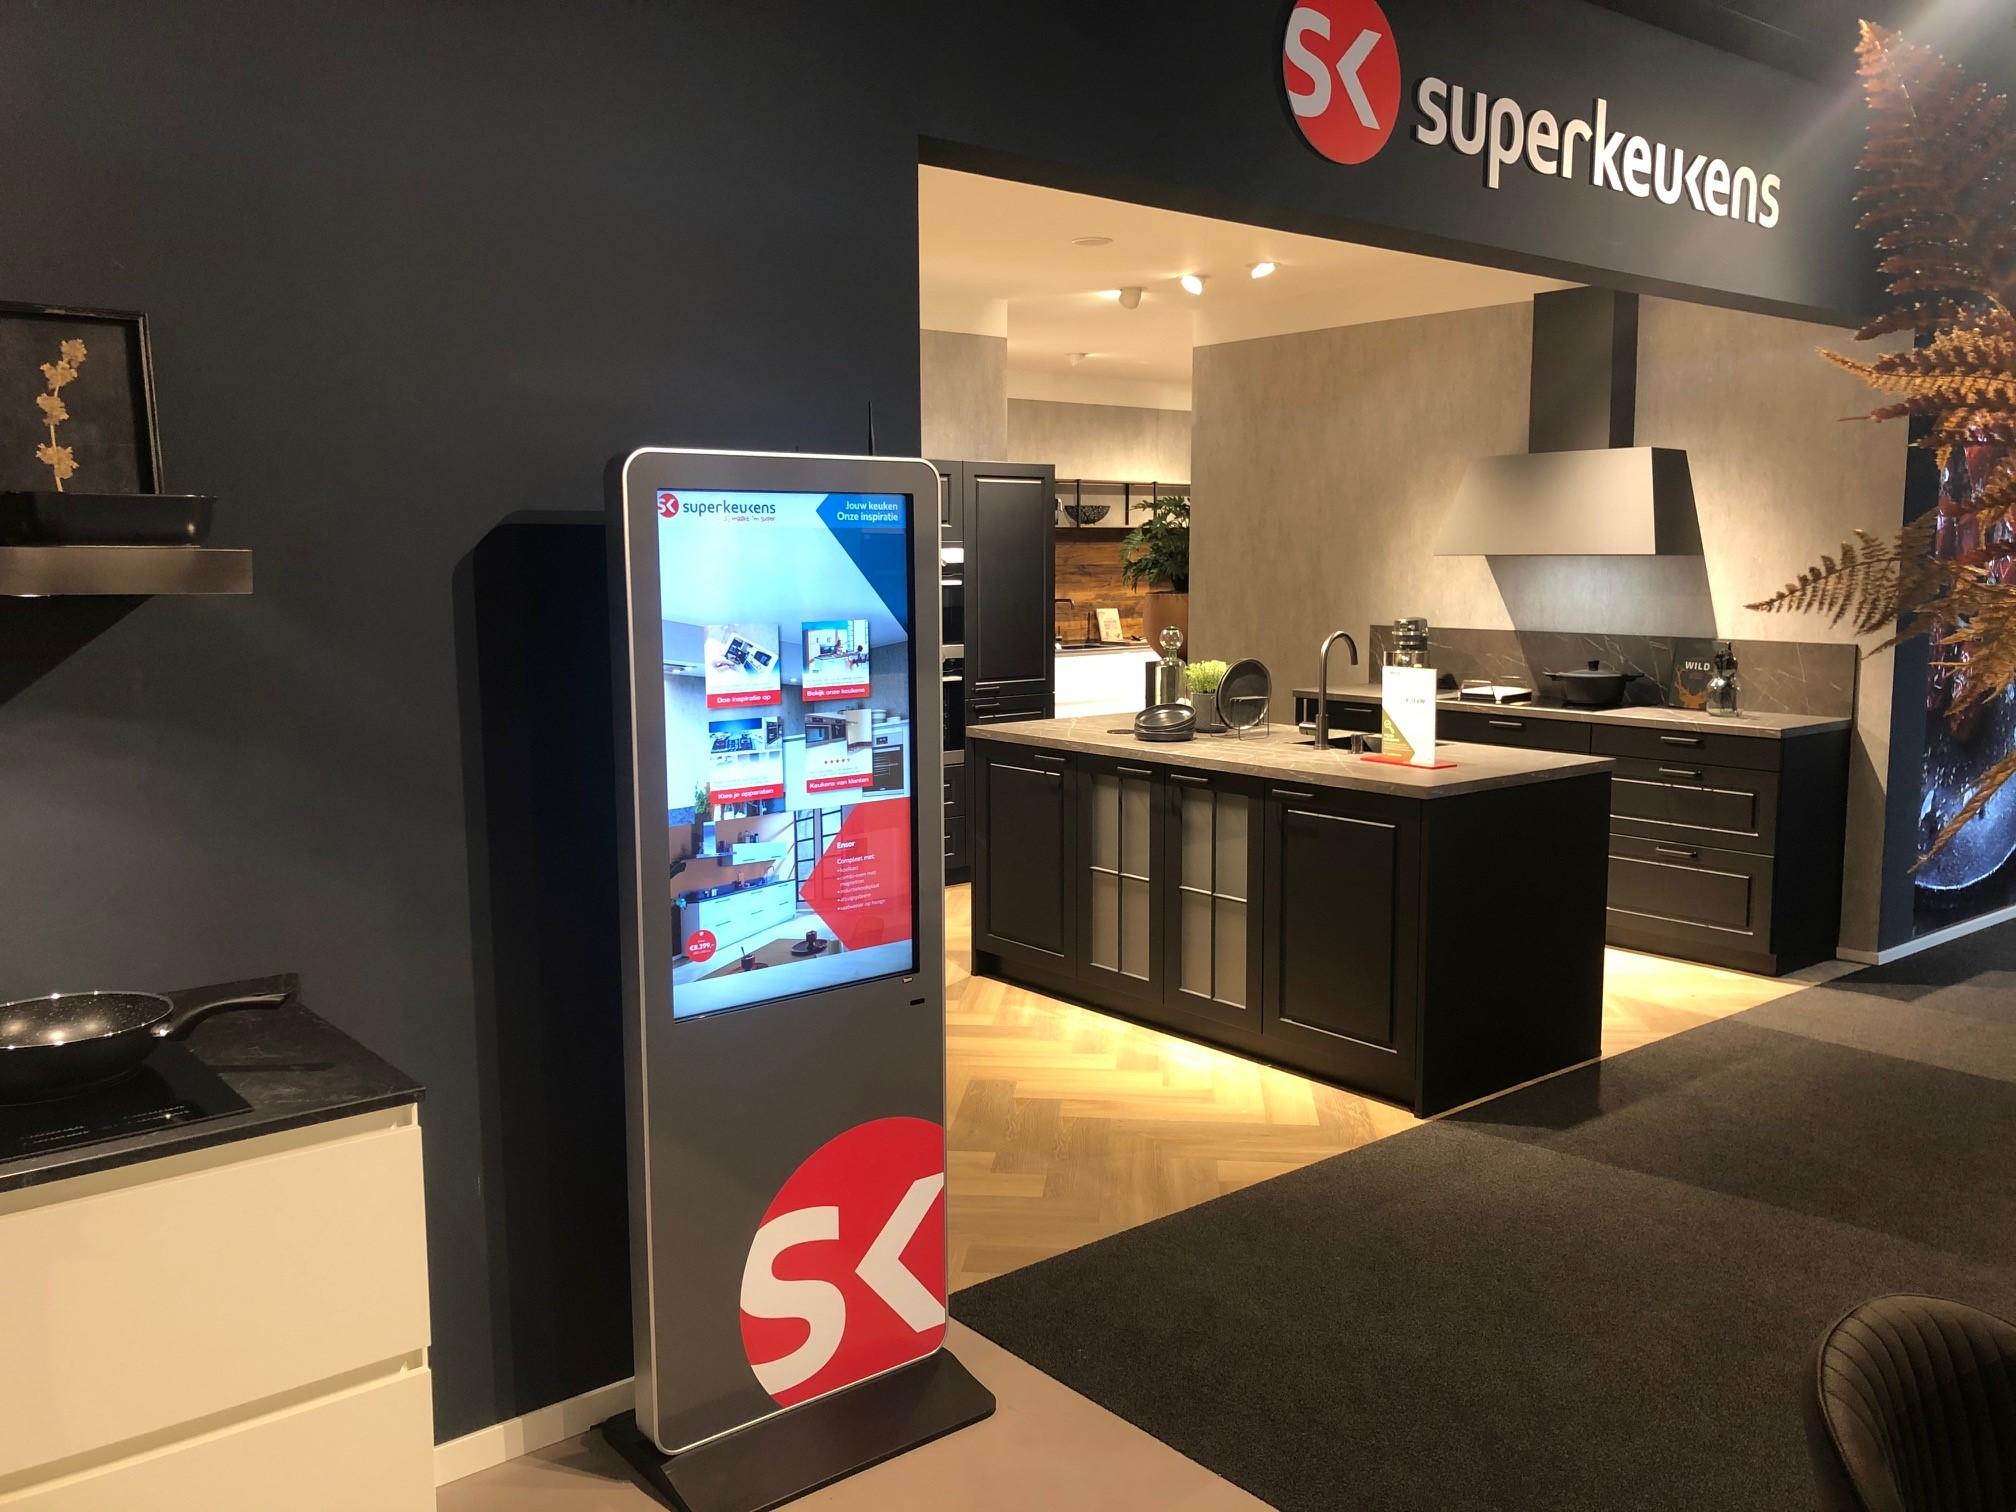 Digital Signage SuperKeukens